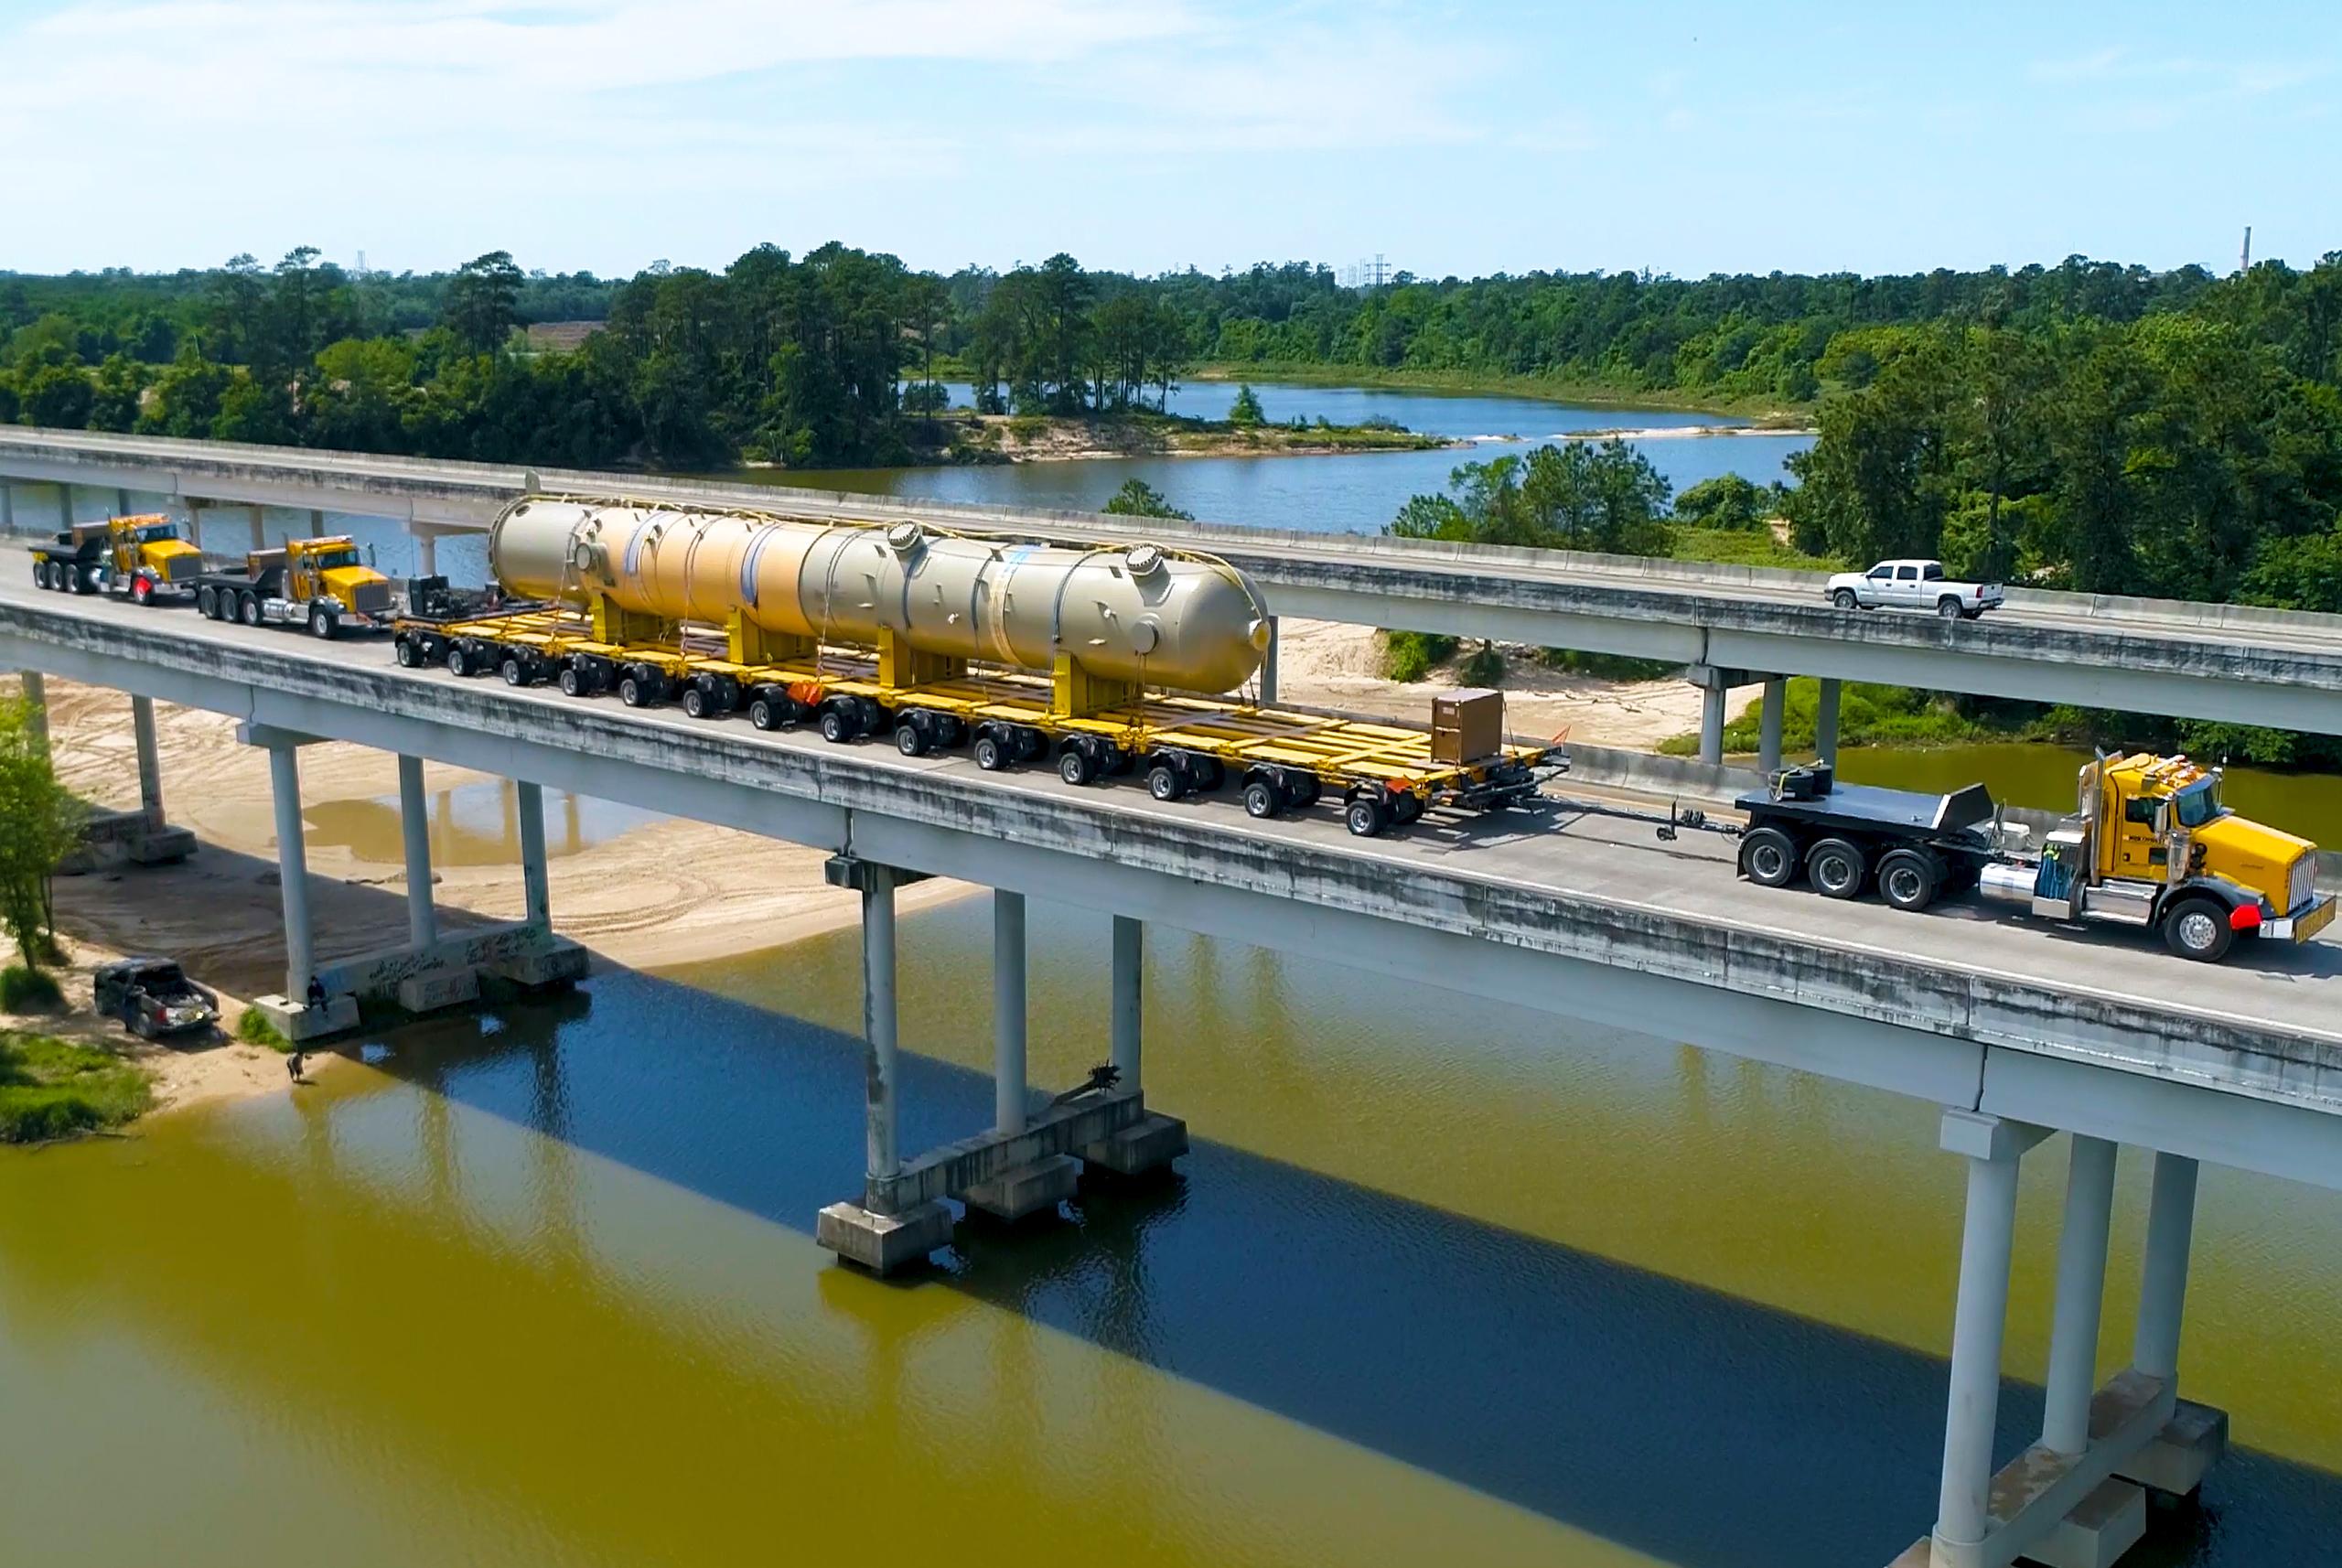 Vessel Crossing Bridge equipment